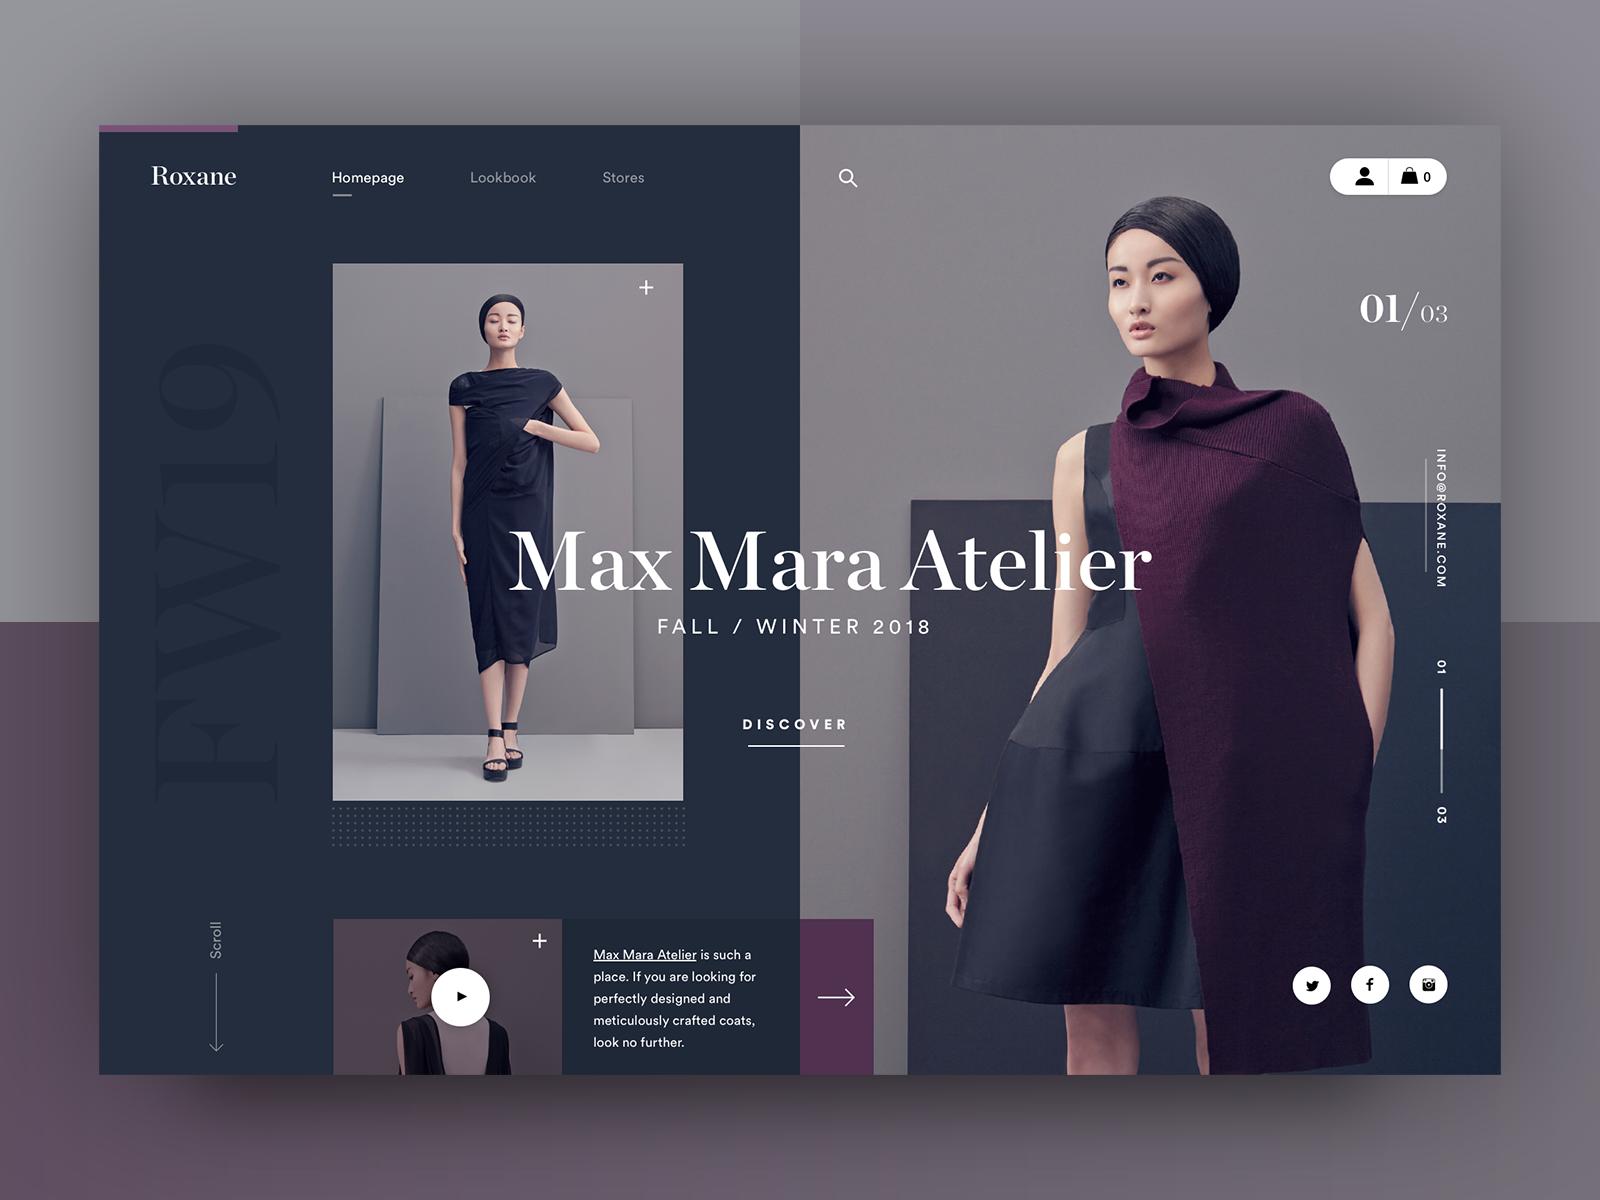 Roxane fashion store - Fall/Winter | Web design inspiration, Minimal  website design, Fashion store